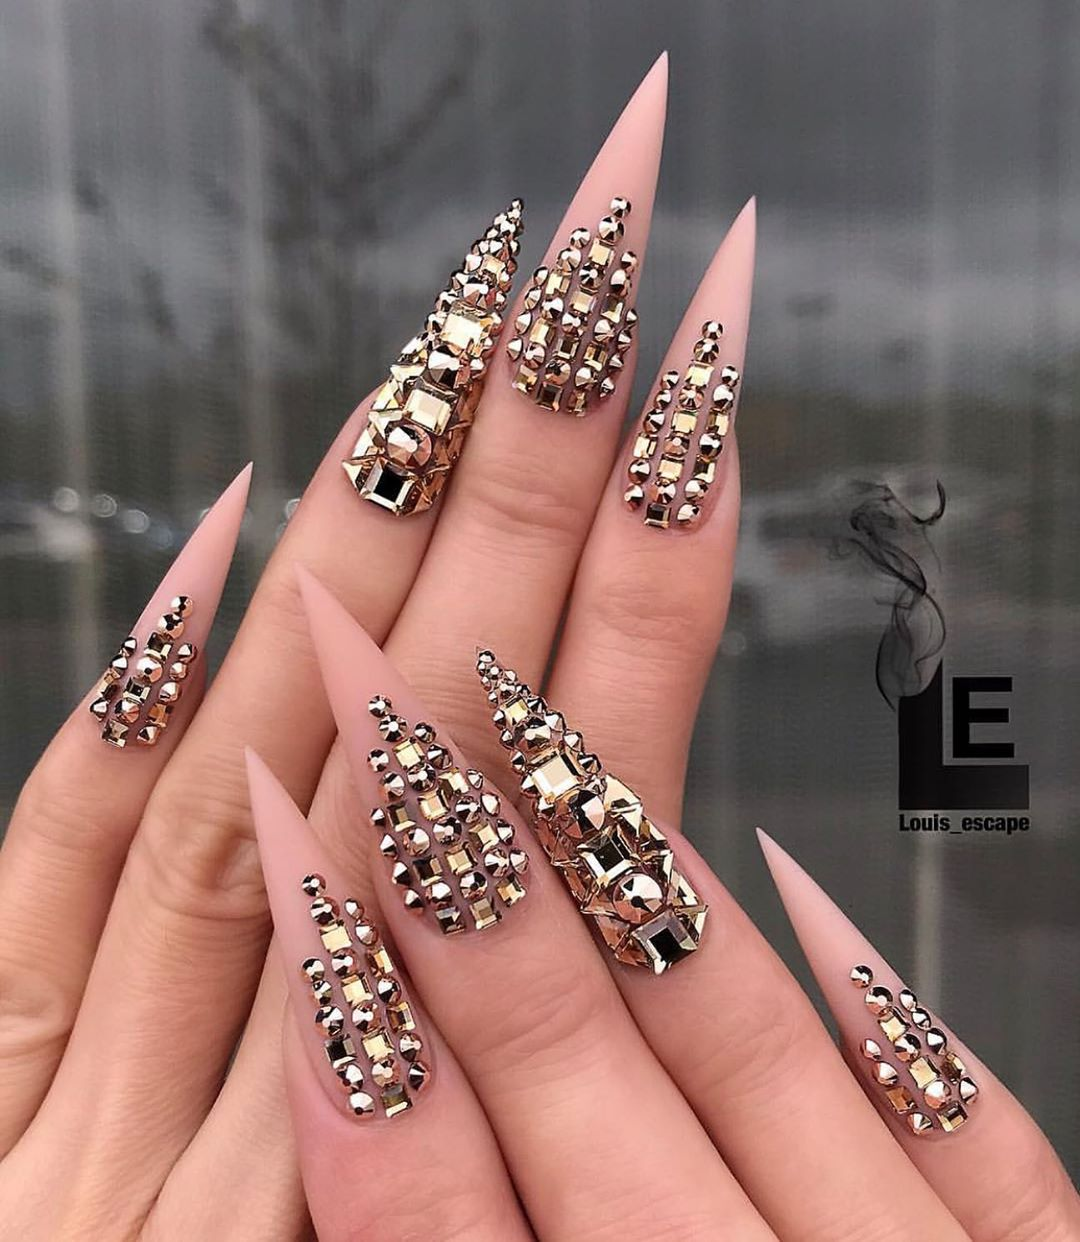 Skin Colour Nail Polish Pointed Nails with Rhinestone Art